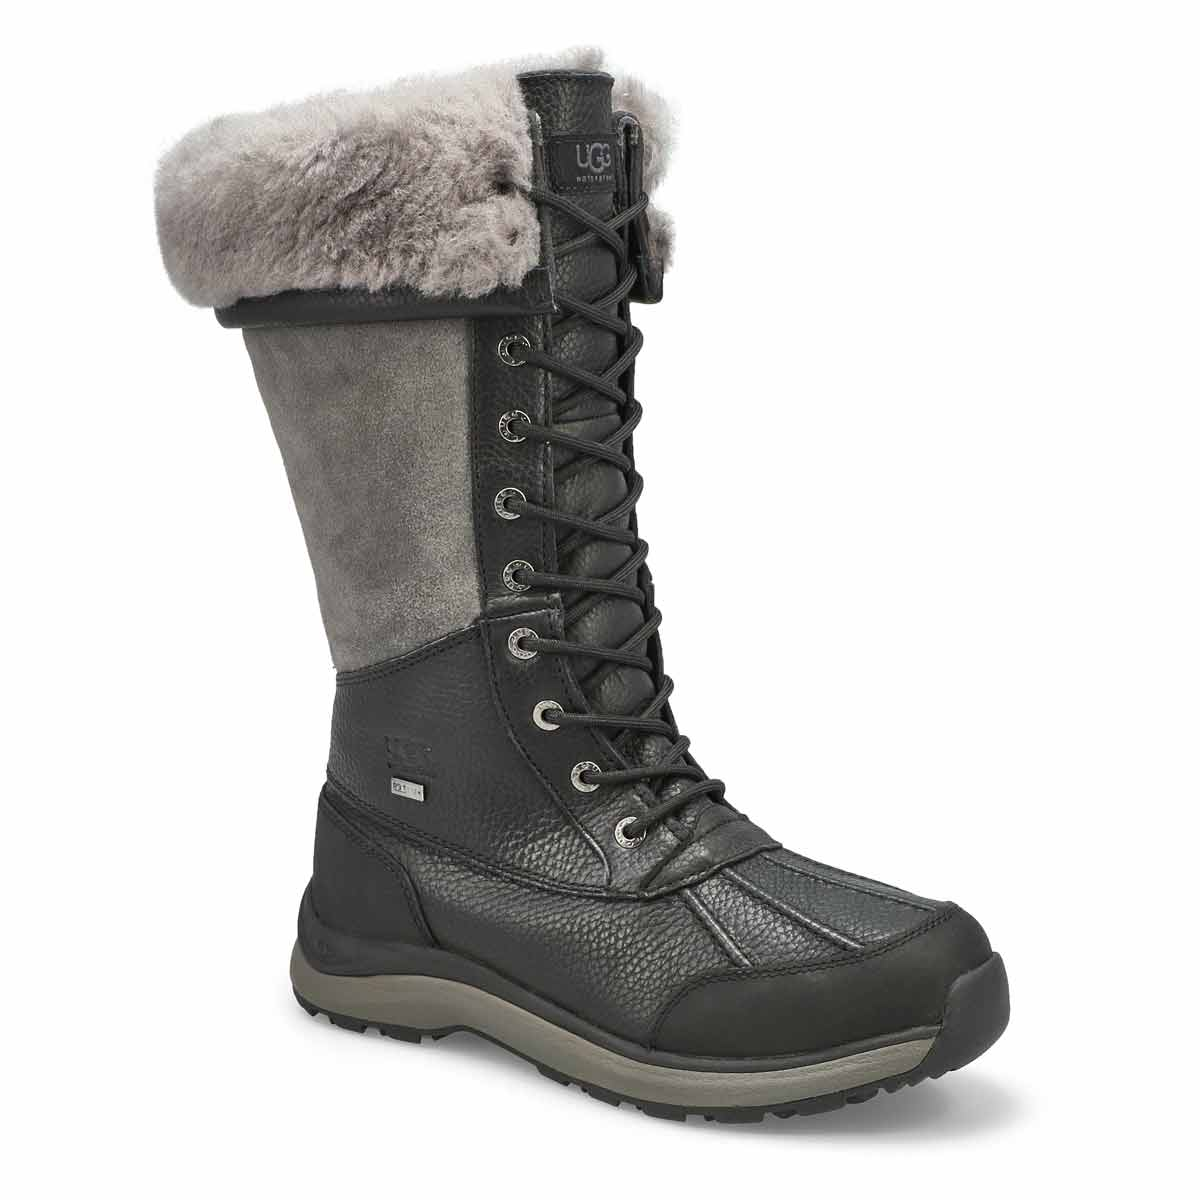 Lds AdirondackTall III black winter boot